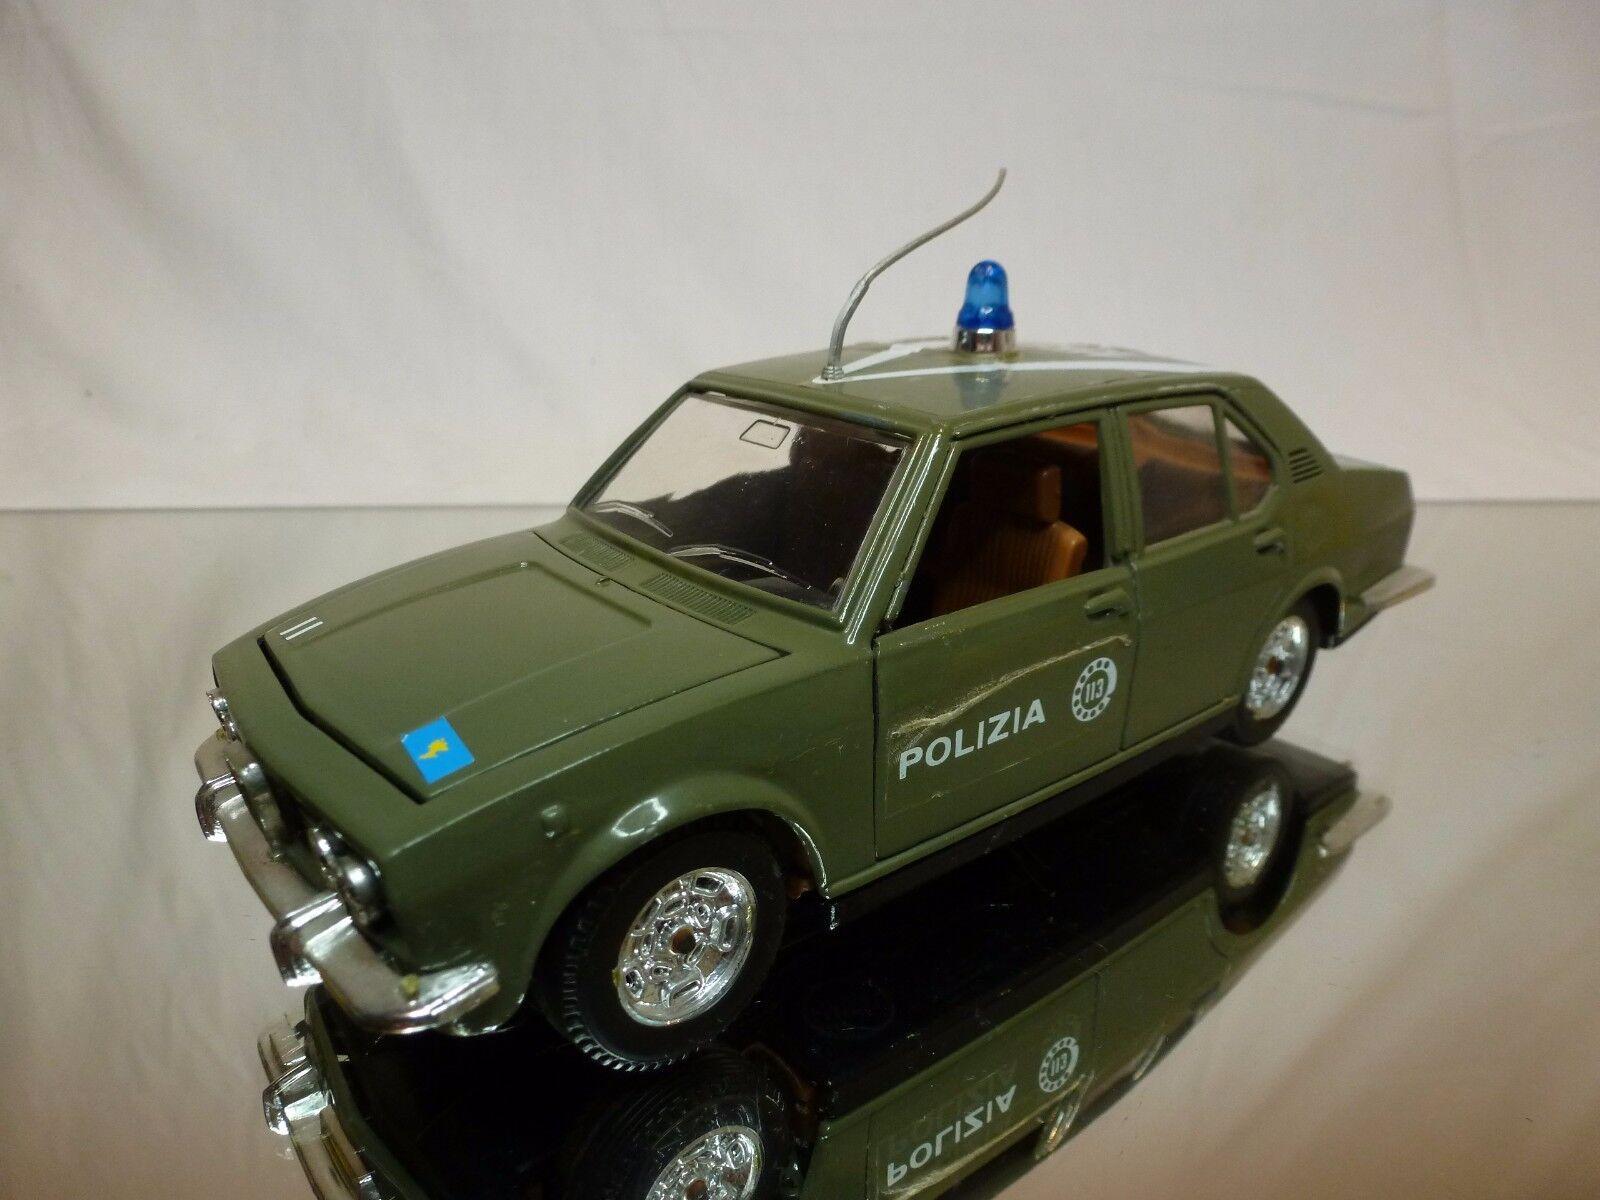 MEBETOYS 8583 ALFA ROMEO ALFETTA - POLIZIA POLICE - verde 1 25 - GOOD CONDITION